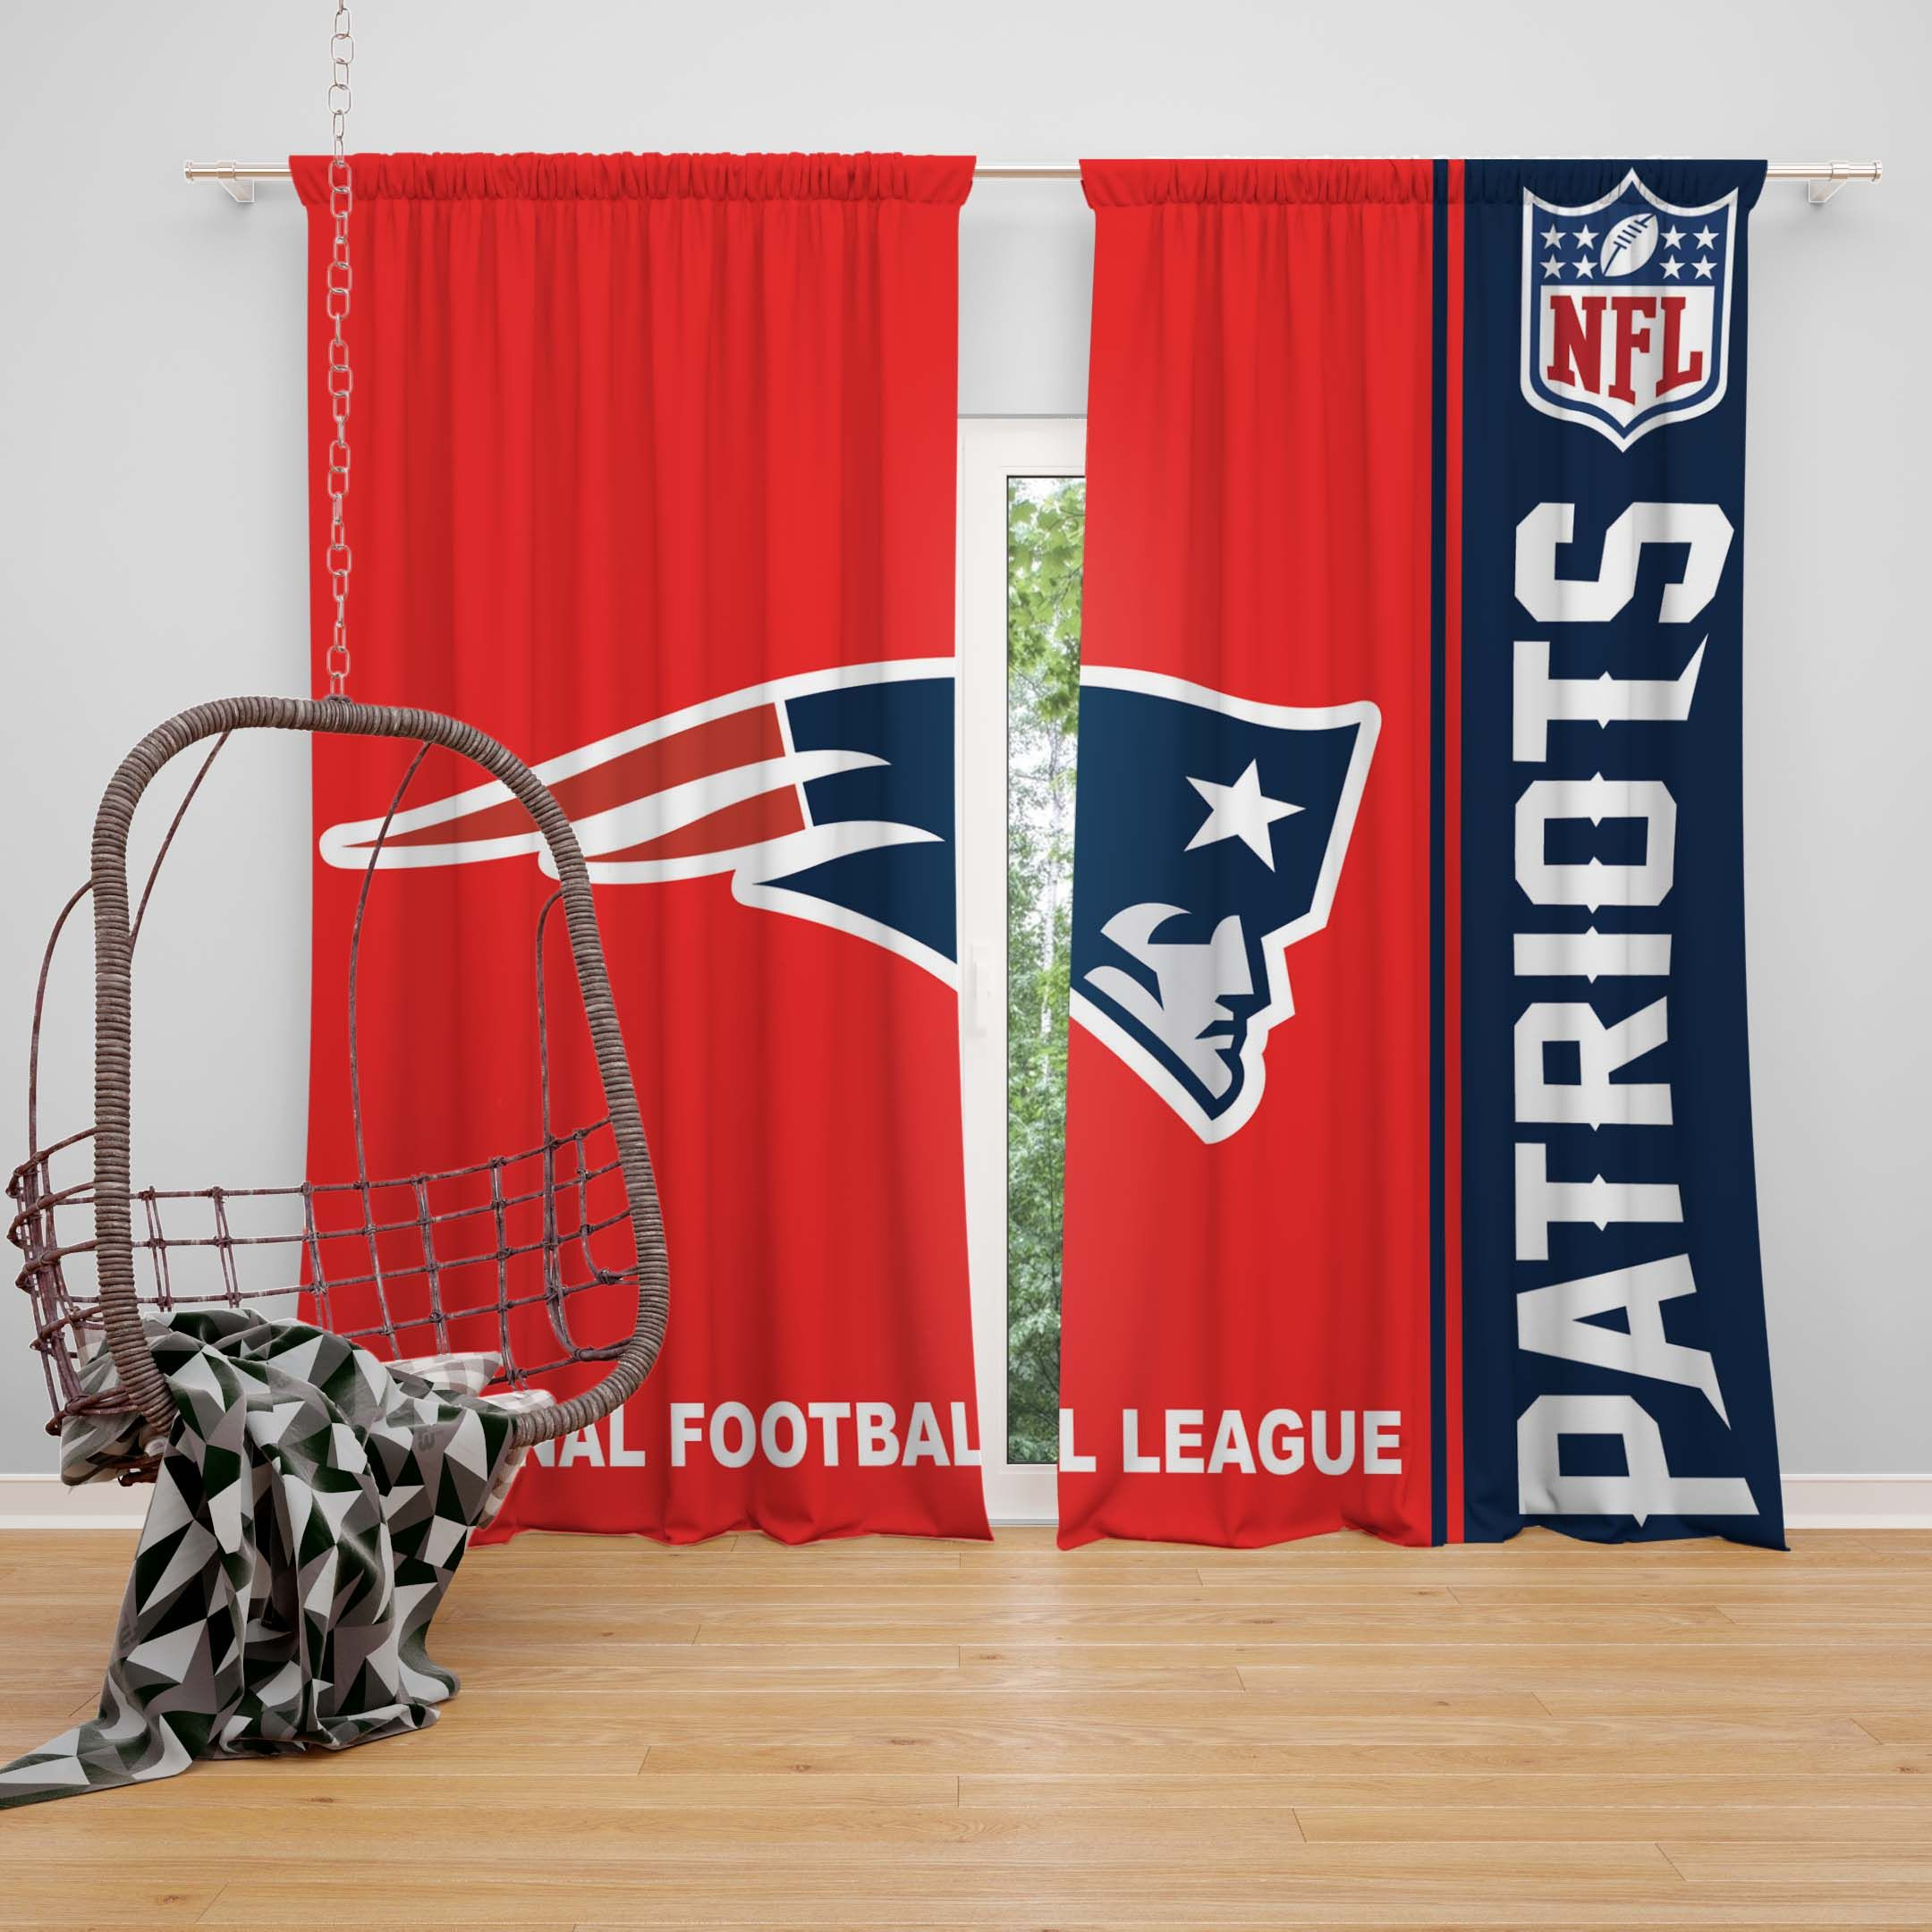 Nfl New England Patriots Bedroom Curtain Patriotic Bedroom Nfl